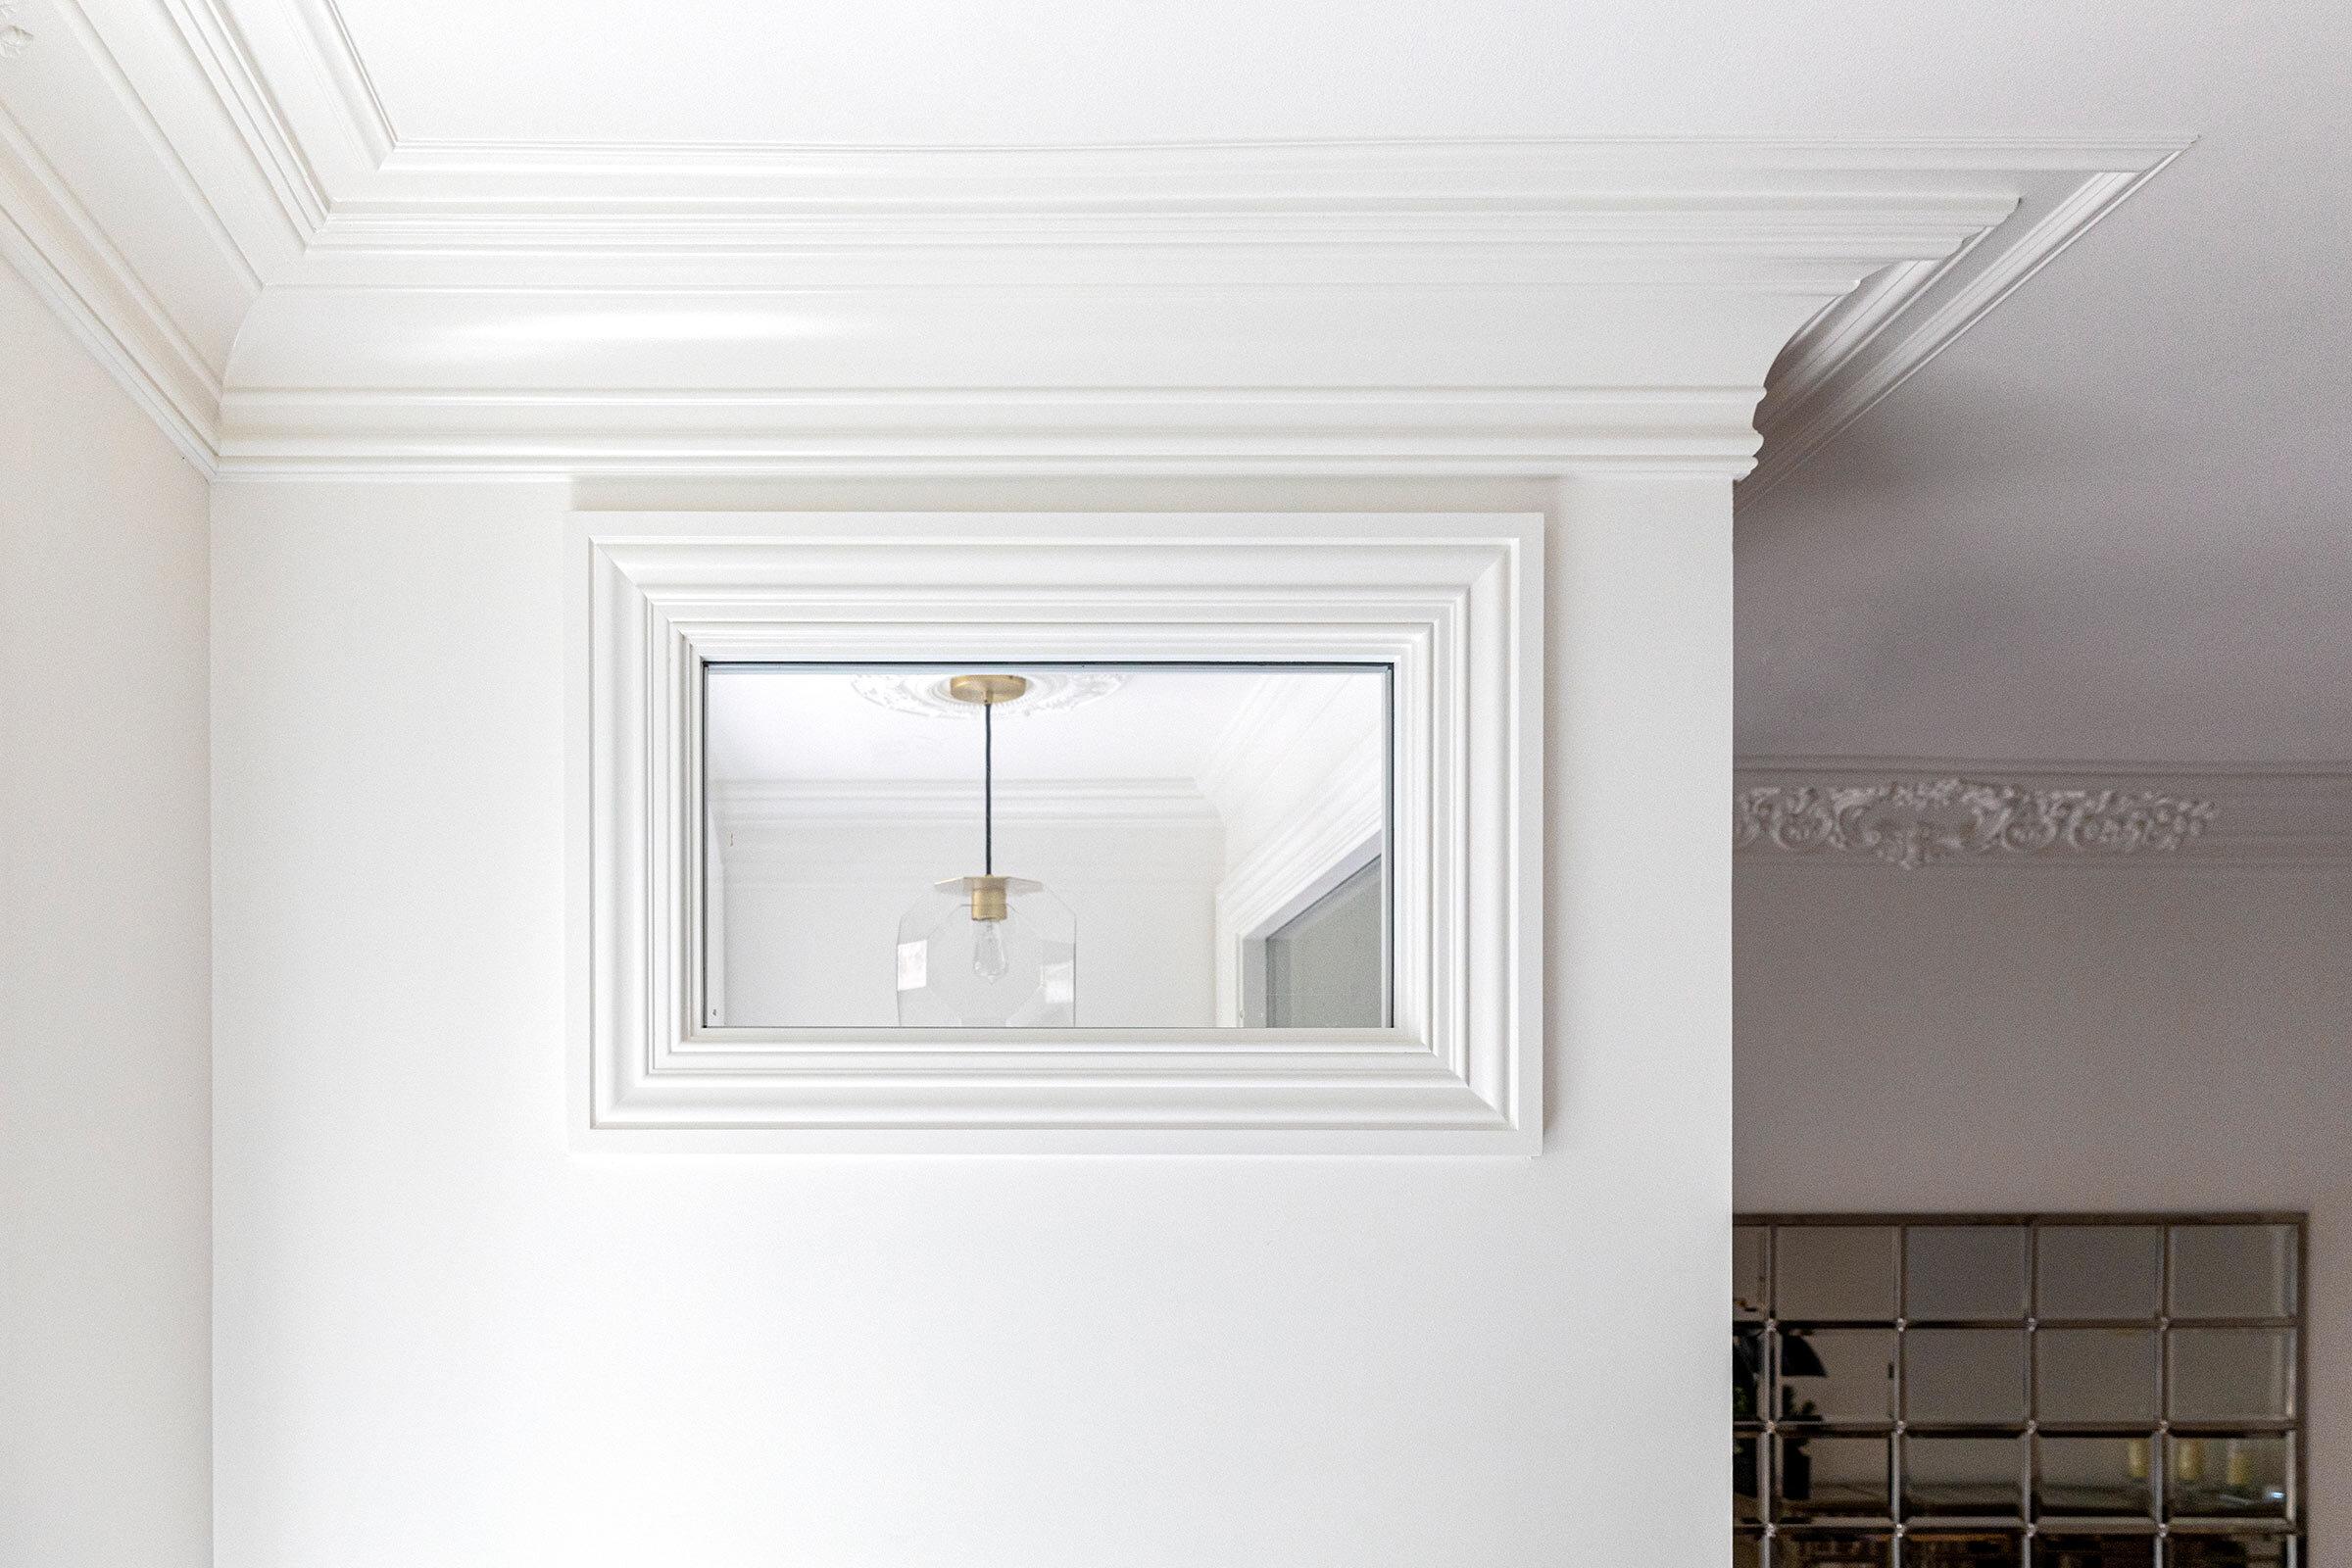 thompson-home-renovations-contractor-window-trim-millwork.jpg